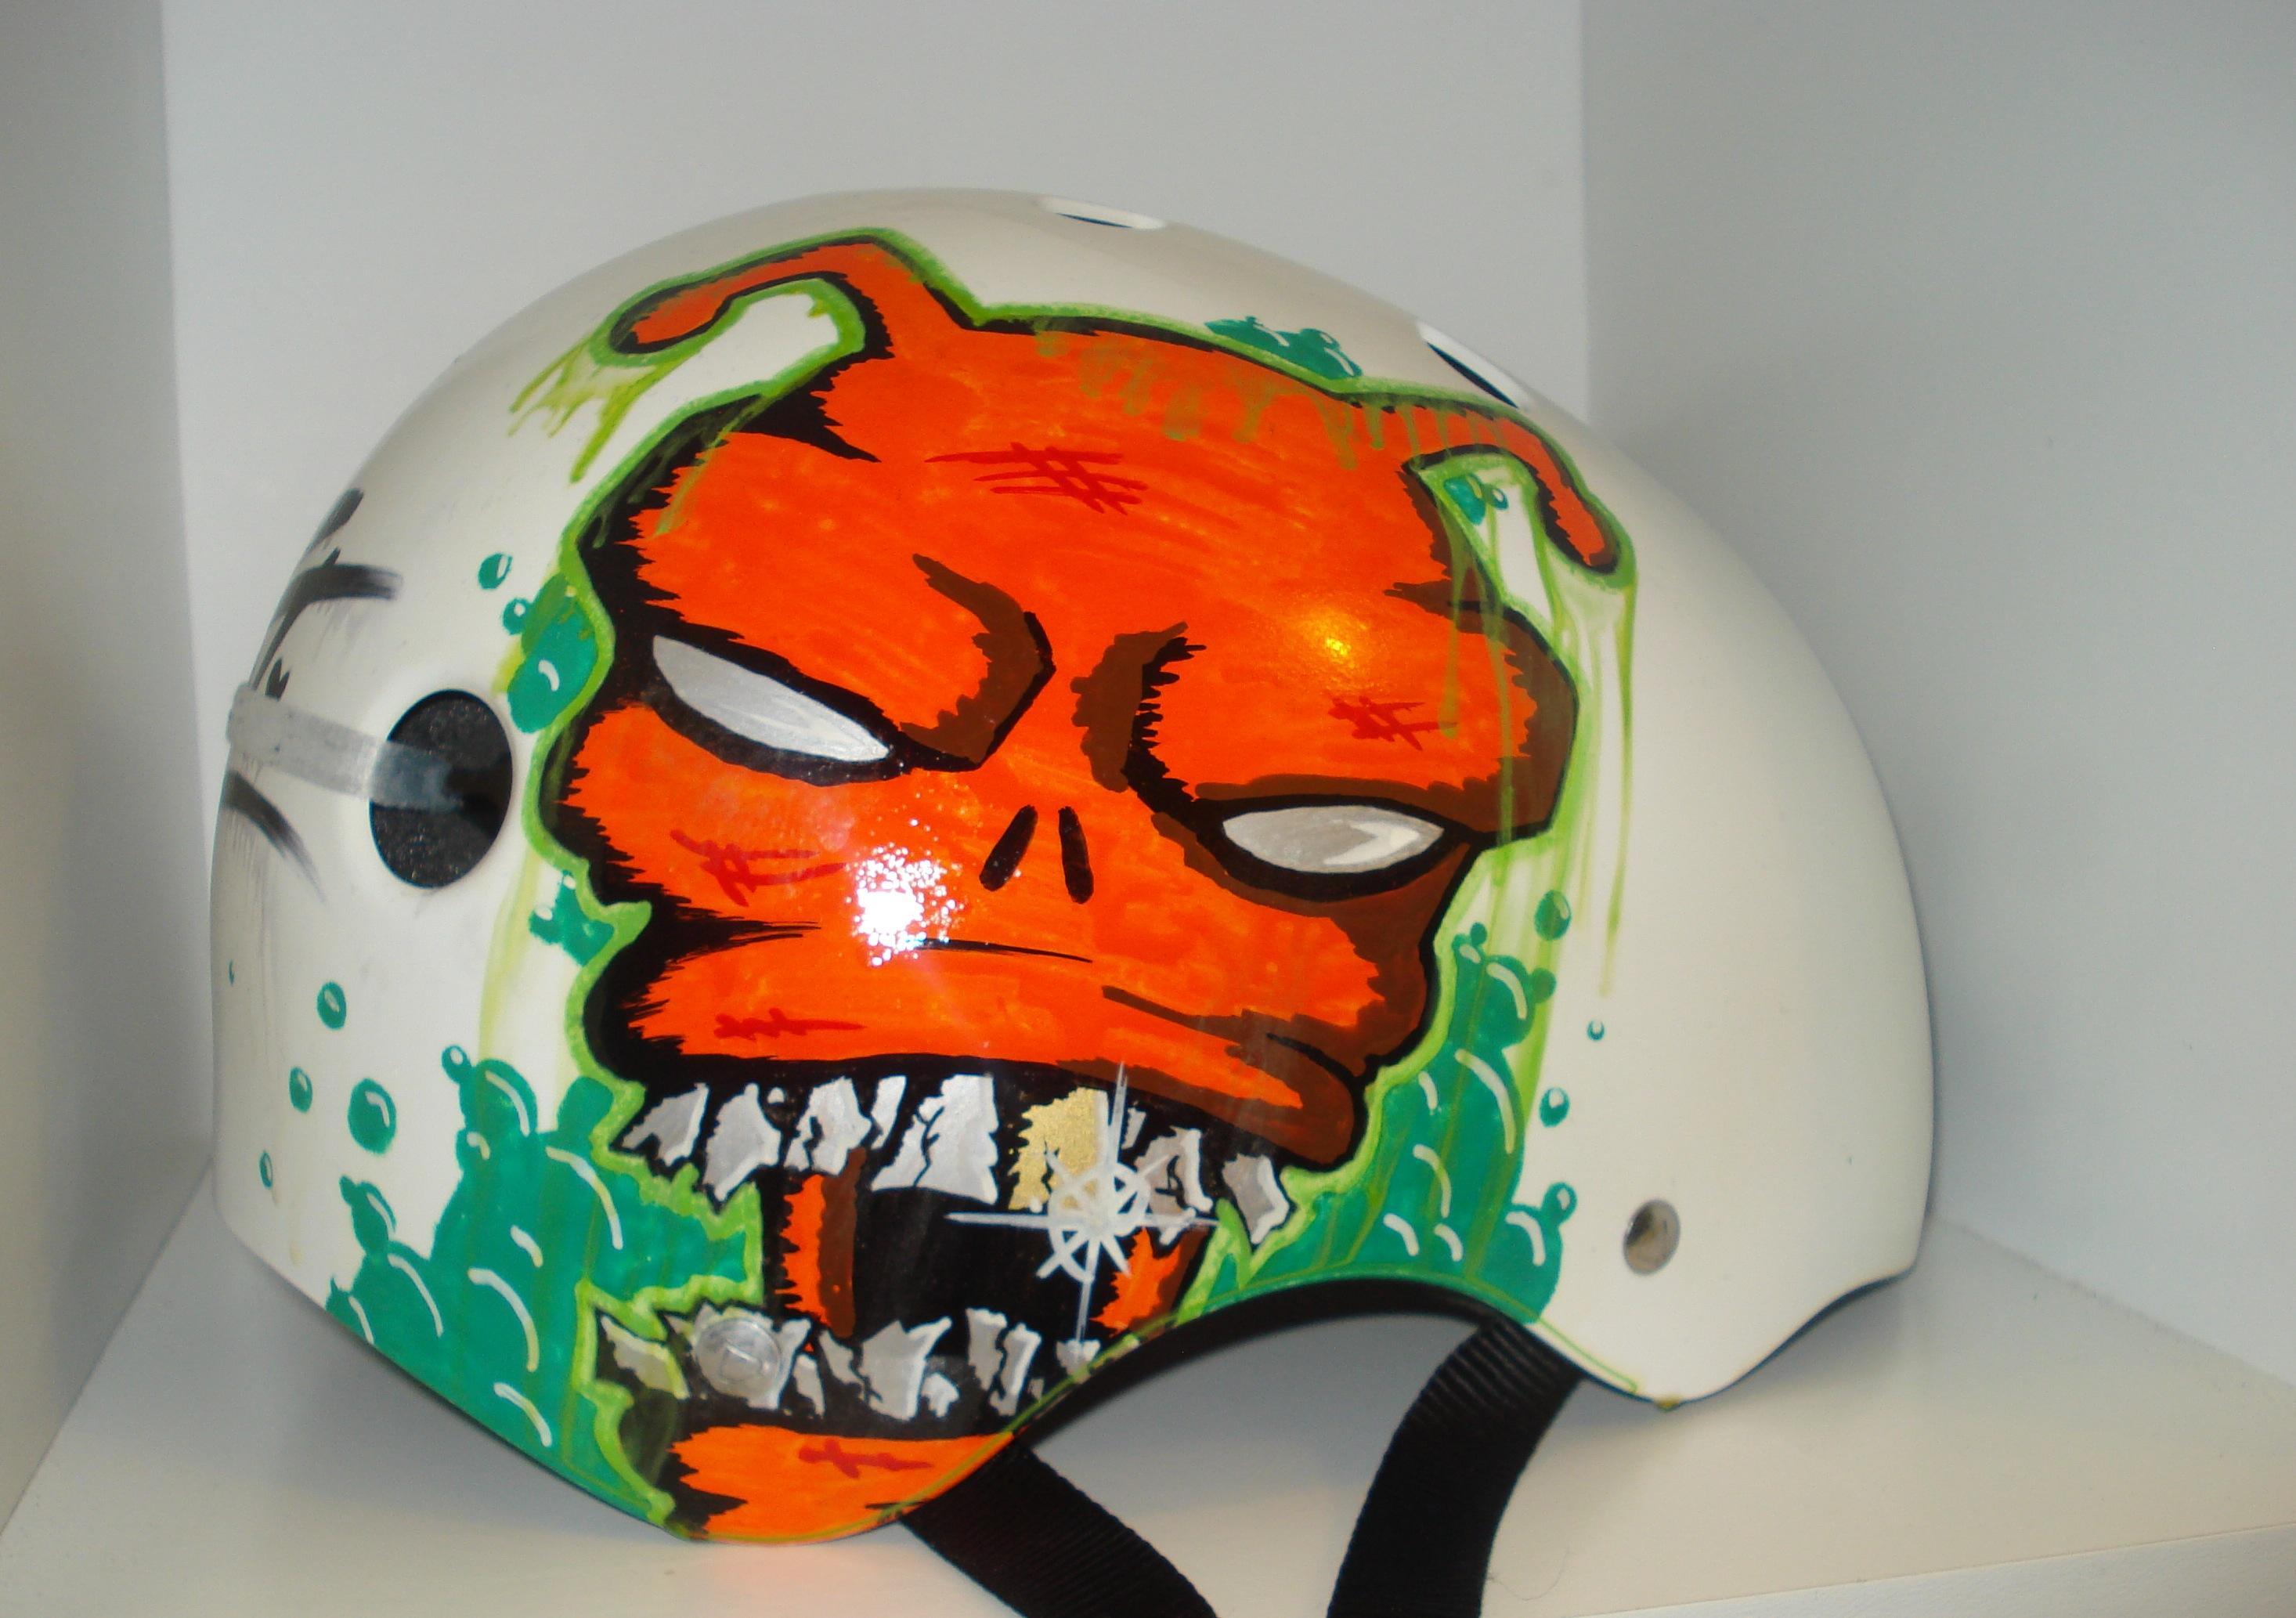 Alien on a Helmet